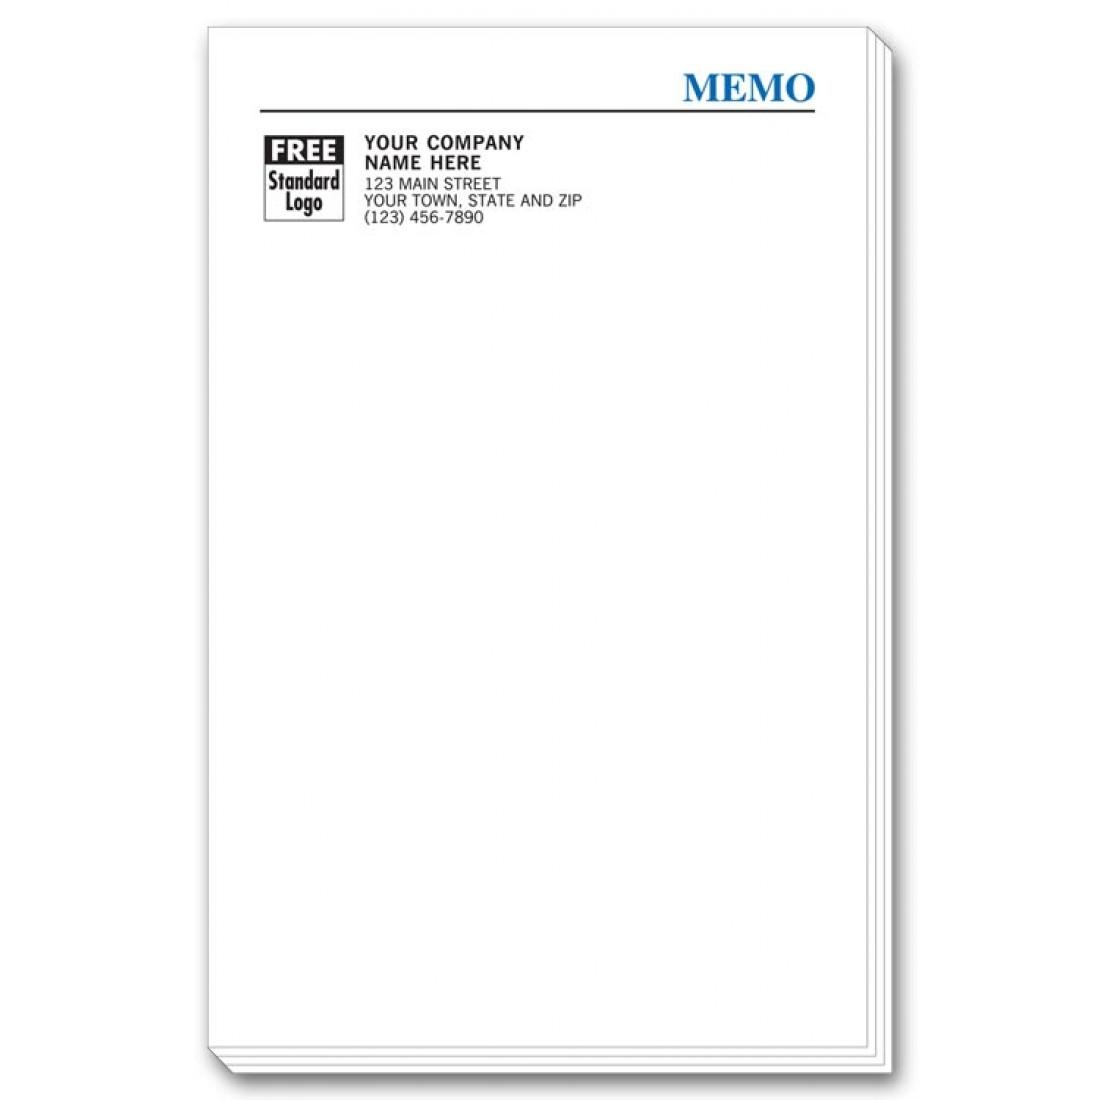 Company Info Imprinted Memo Pads